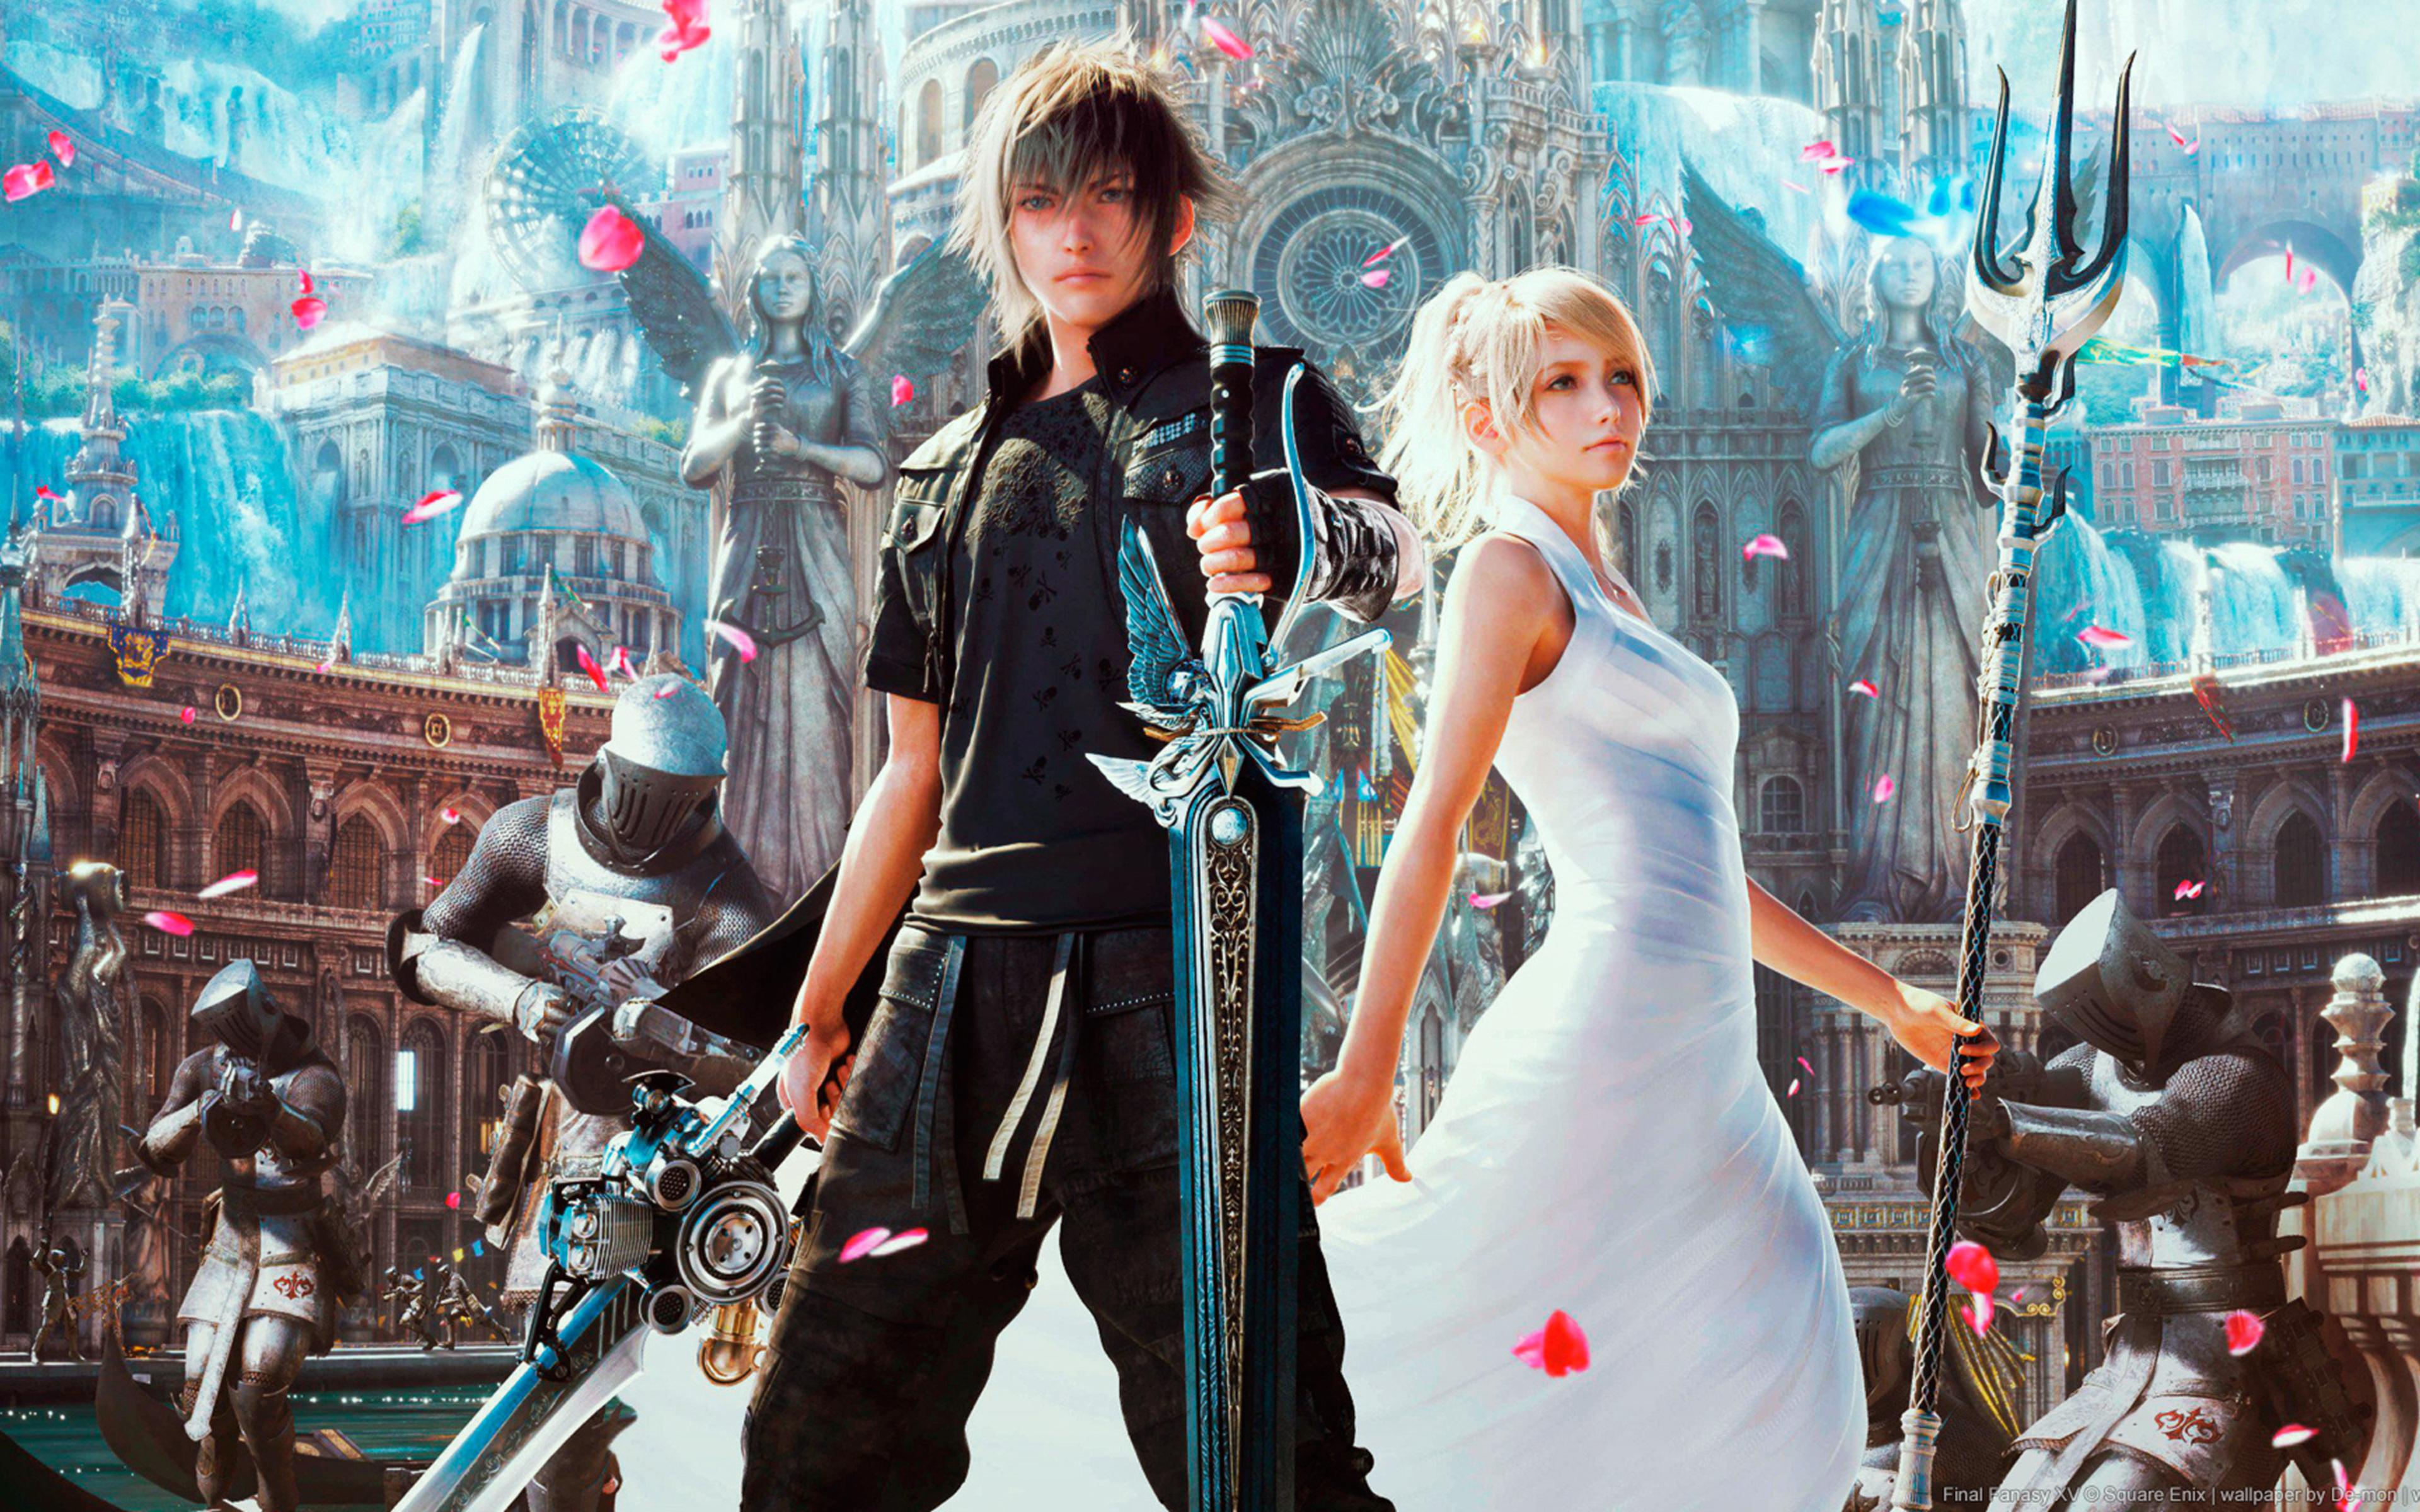 2560x1080 Final Fantasy Xv Ps4 2560x1080 Resolution Hd 4k: 3840x2400 Final Fantasy Xv Artwork 4k HD 4k Wallpapers